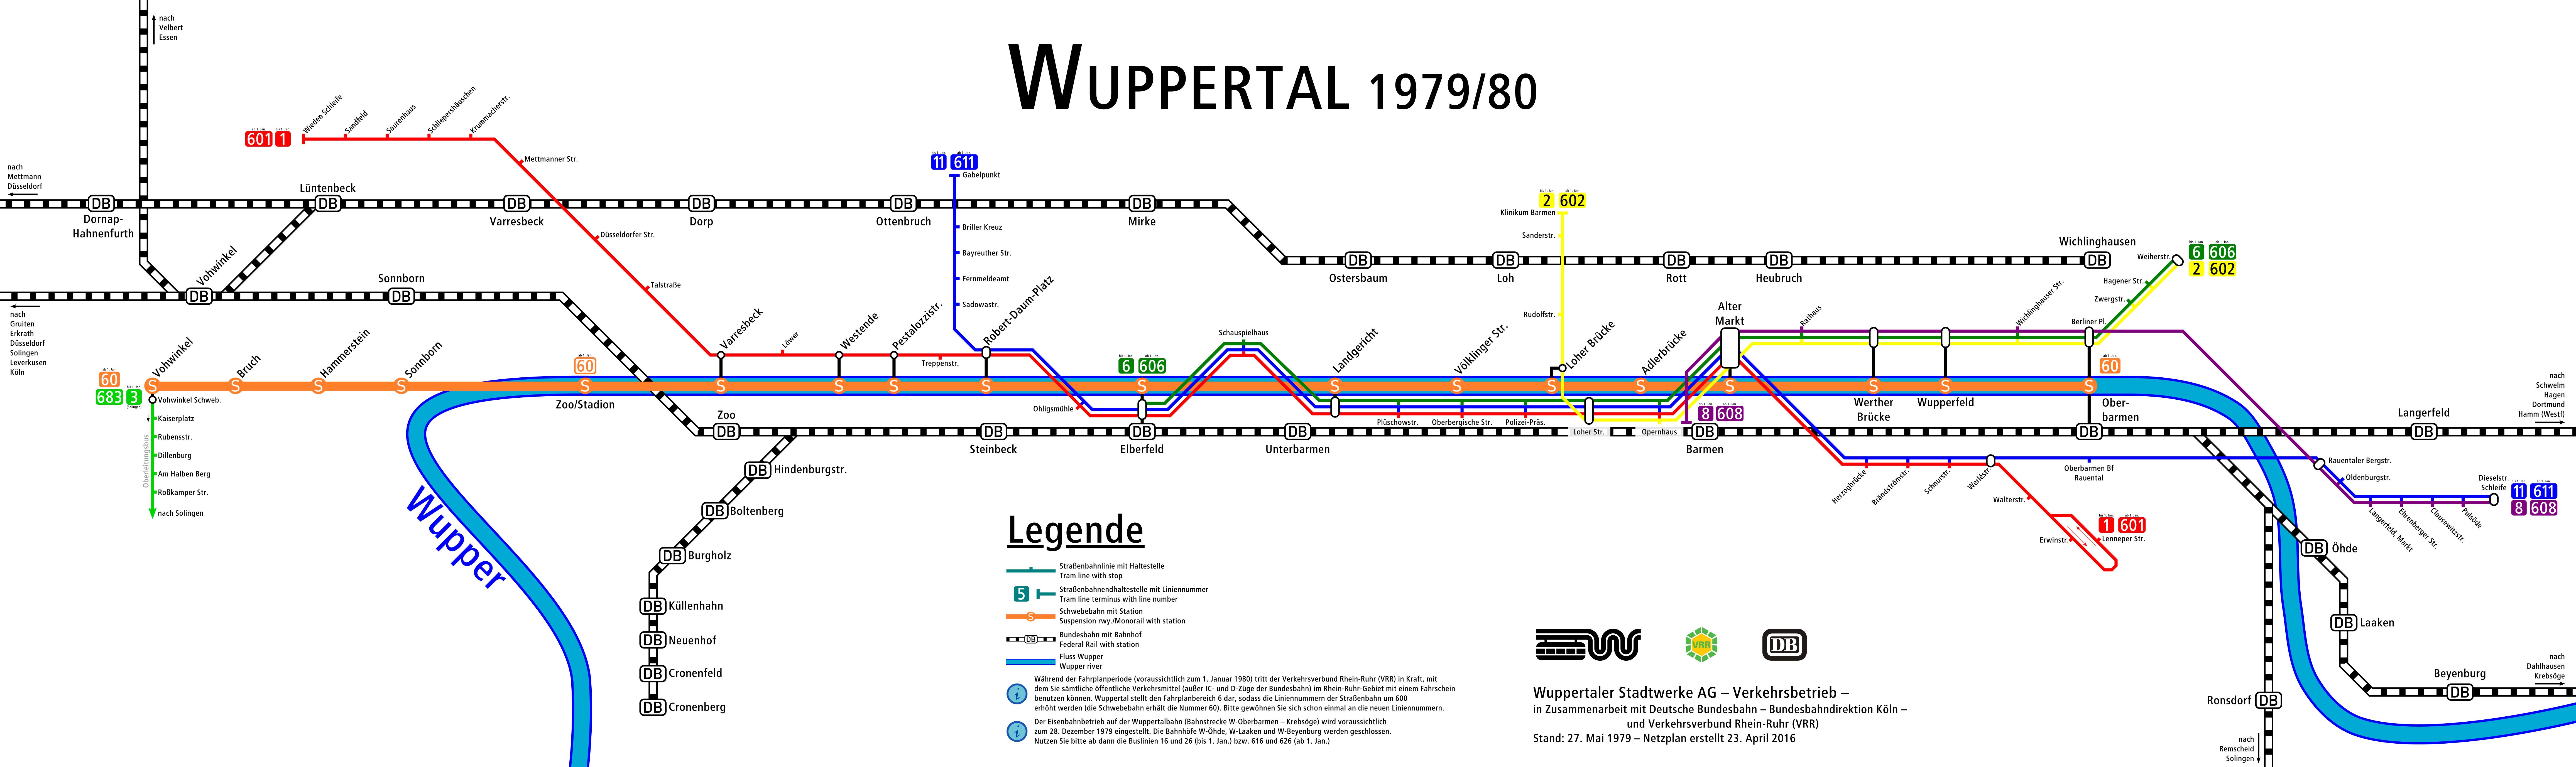 FileNetzplan Wuppertal 1979 und 80png Wikimedia Commons